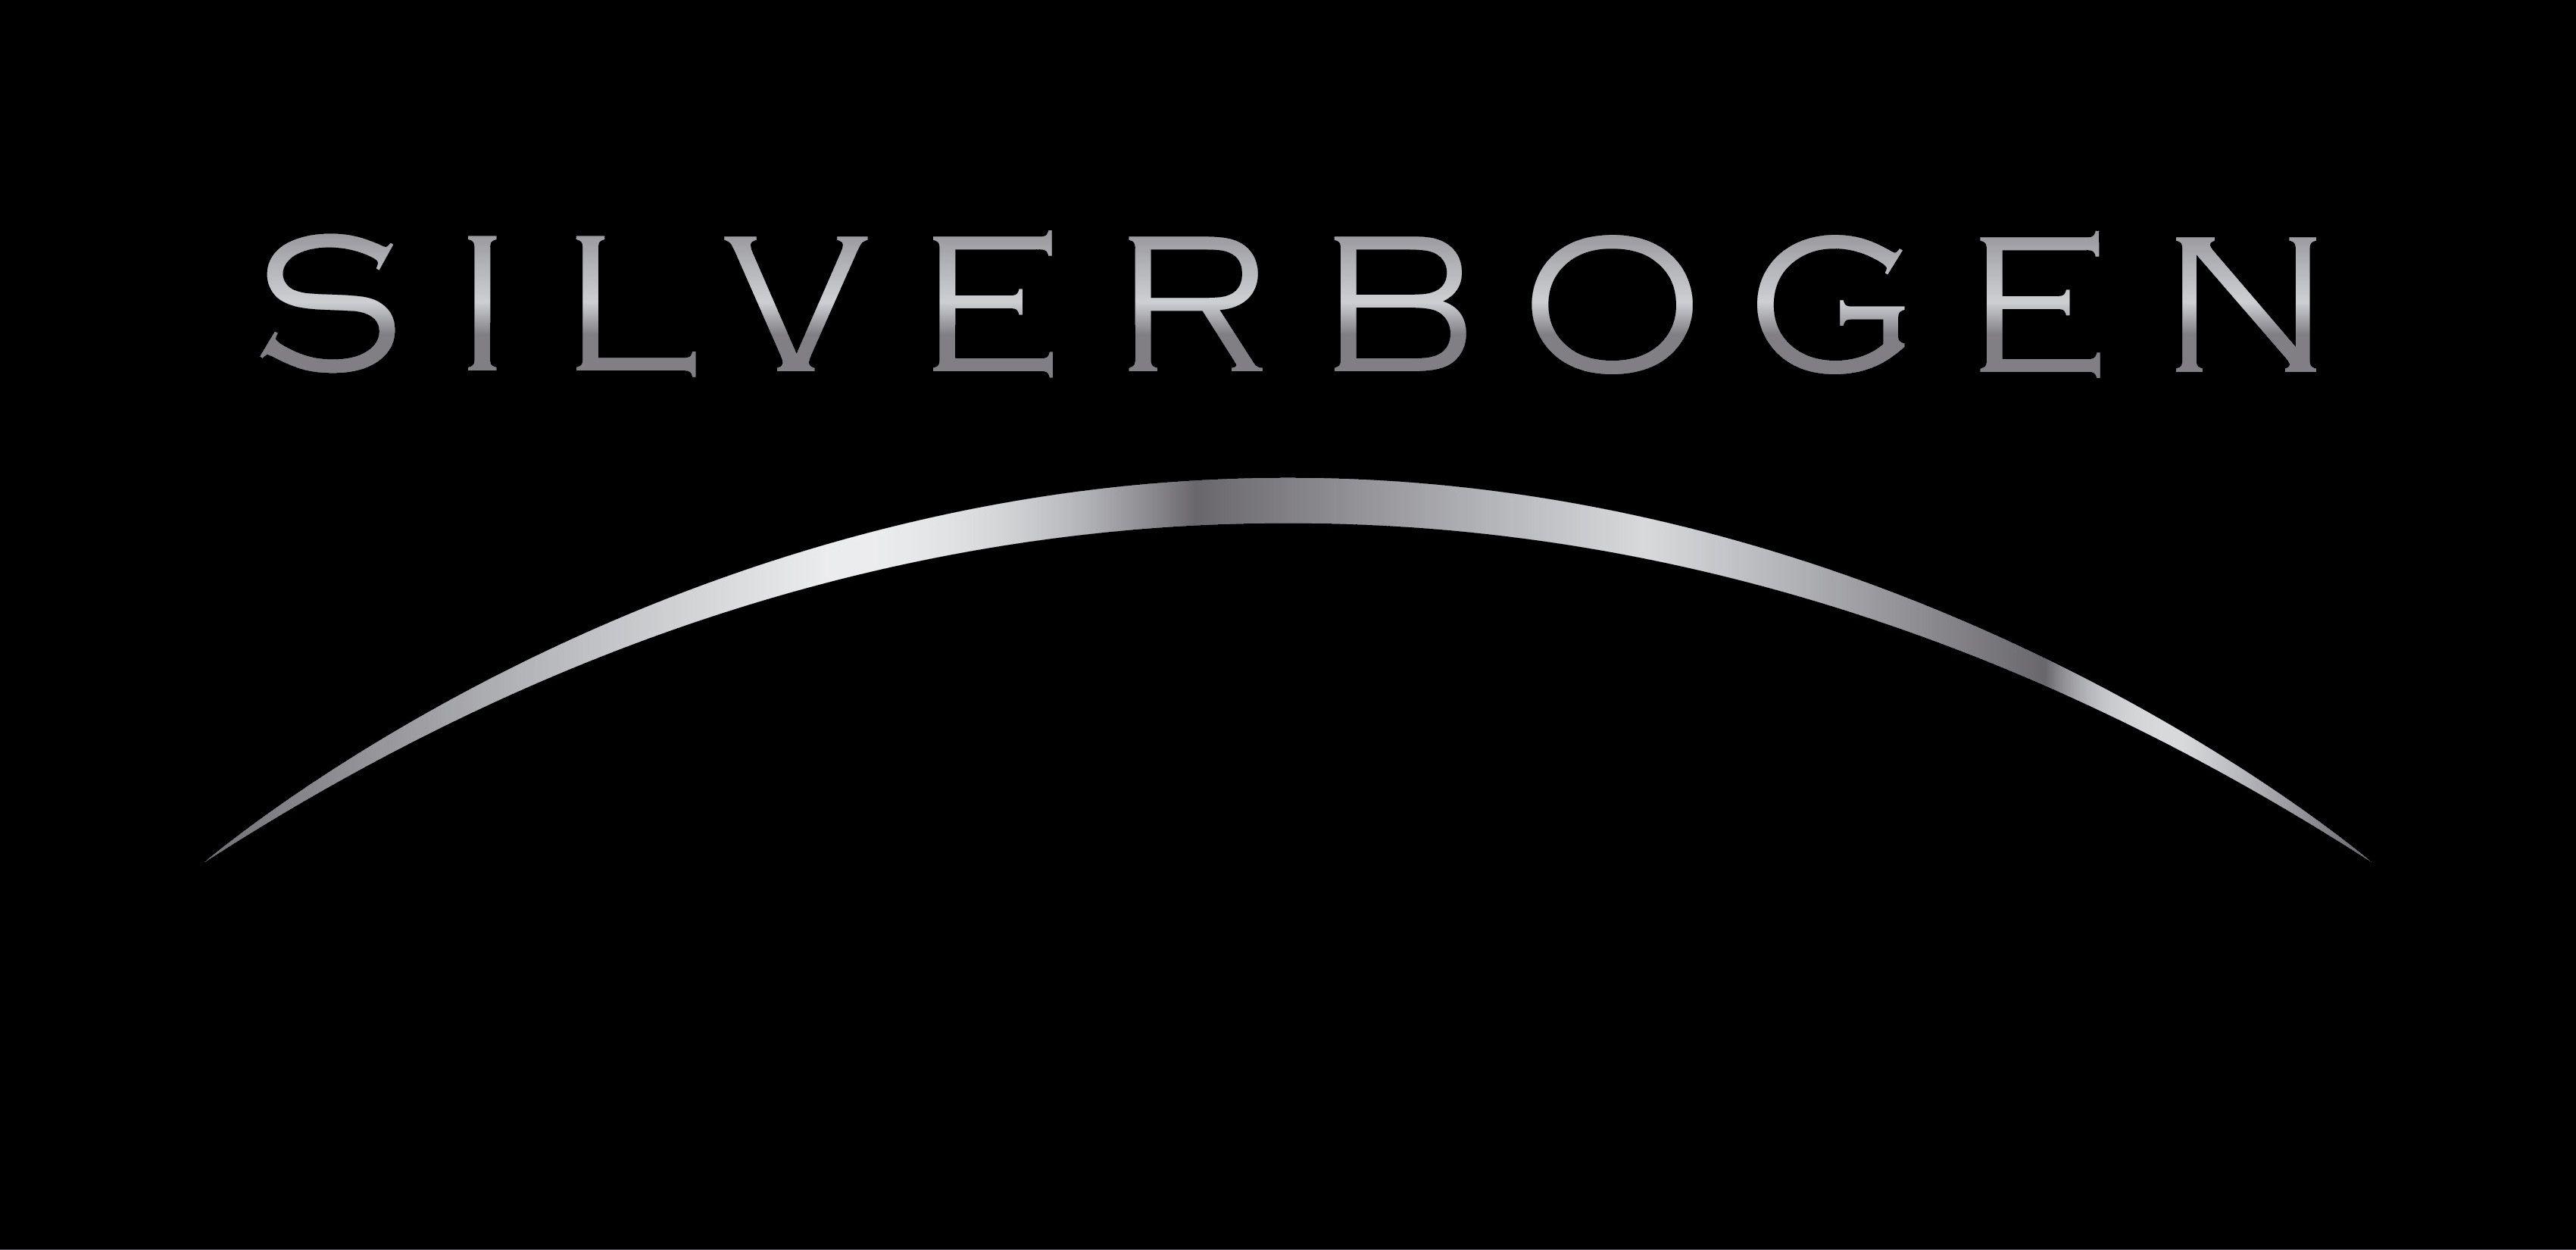 Silverbogen